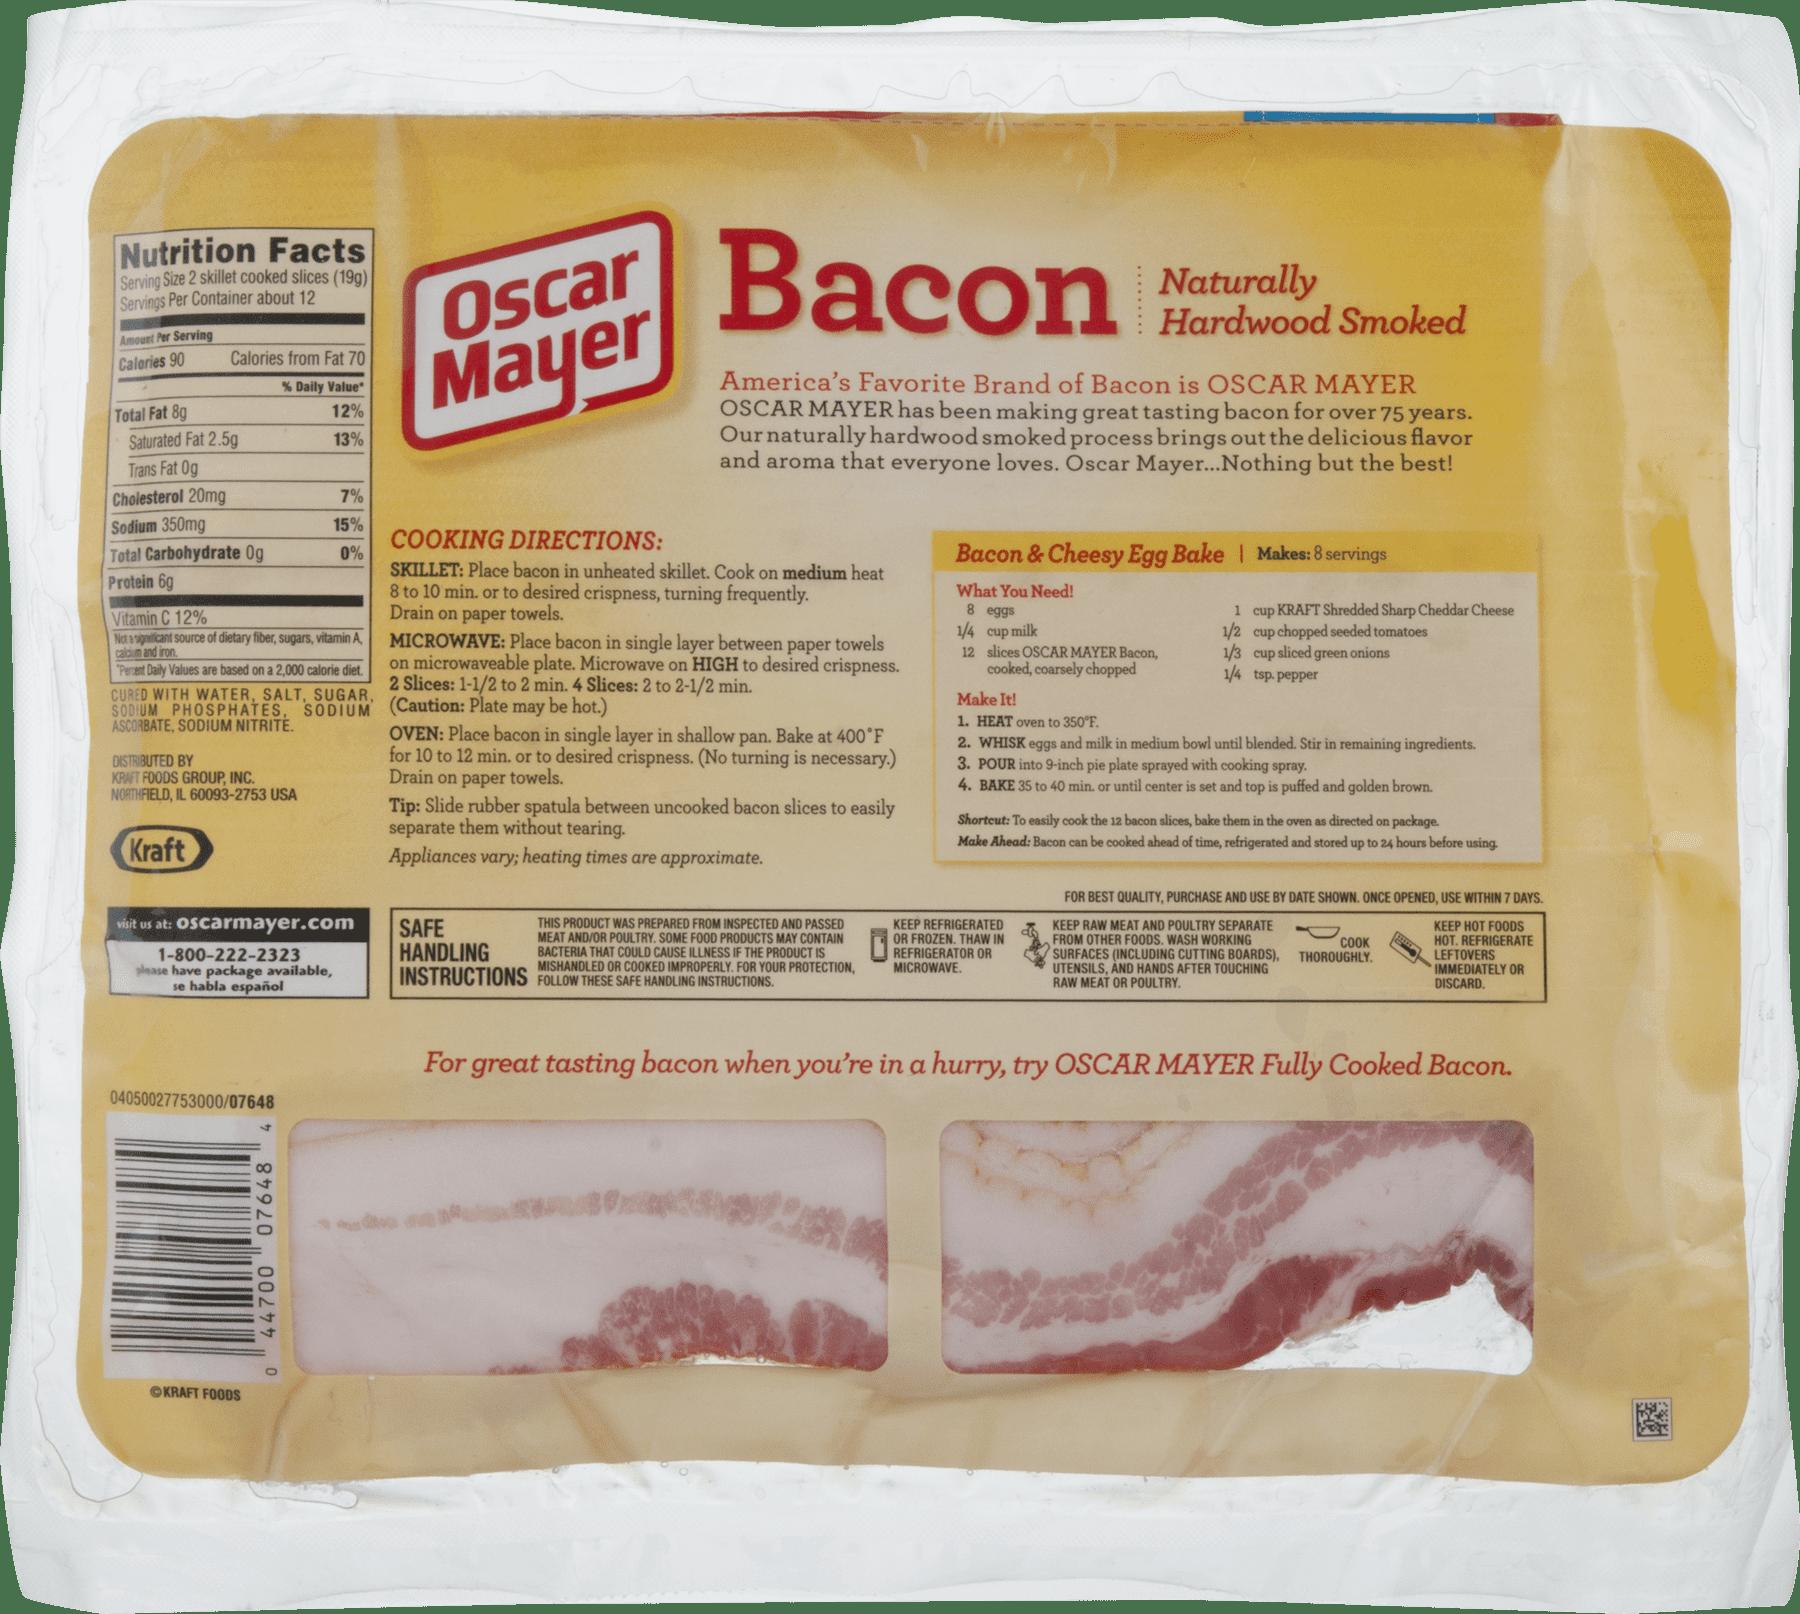 Overview additionally 10293339 likewise 10292650 likewise Oscar Mayer Turkey Bacon Calories haxlVelScCPklArGxkI D gPFwN iv4NrYHFsvaqTMB5o5OeCMv 9whJ0iYMG1qFv6z4zj3Bshf7FH lo6Bw0g also 10448254. on oscar mayer fully cooked bacon walmart